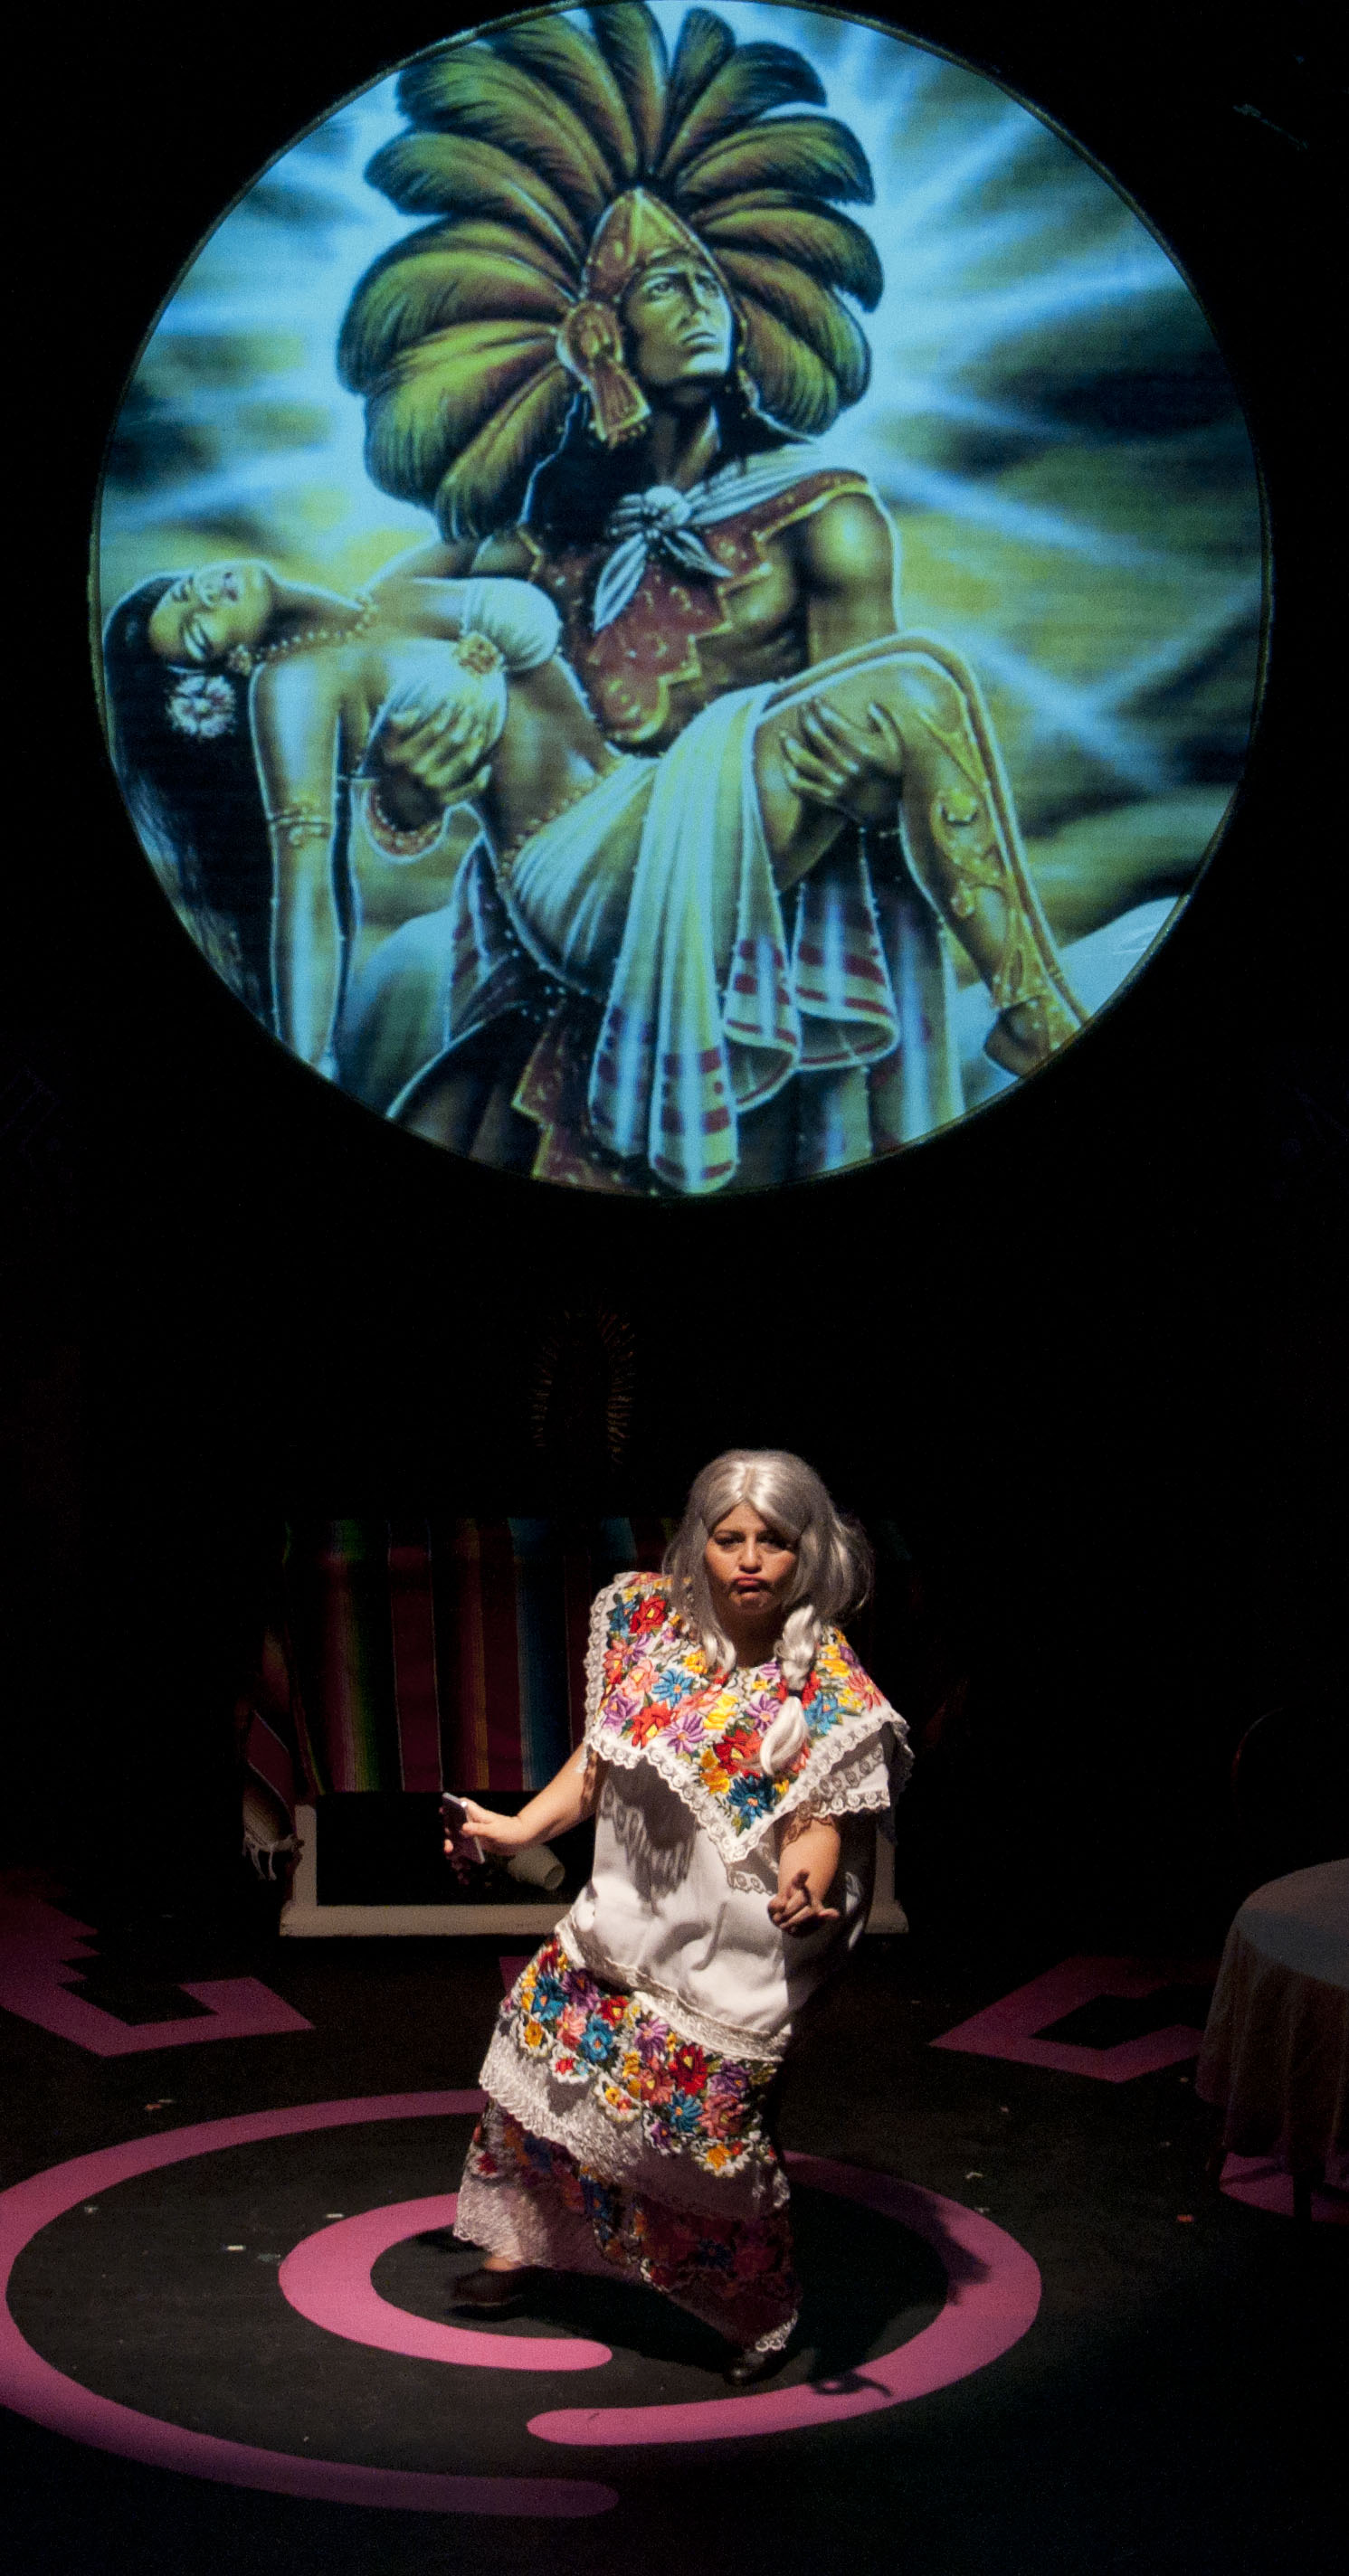 Chicana Abuela y Chicanita Nieta